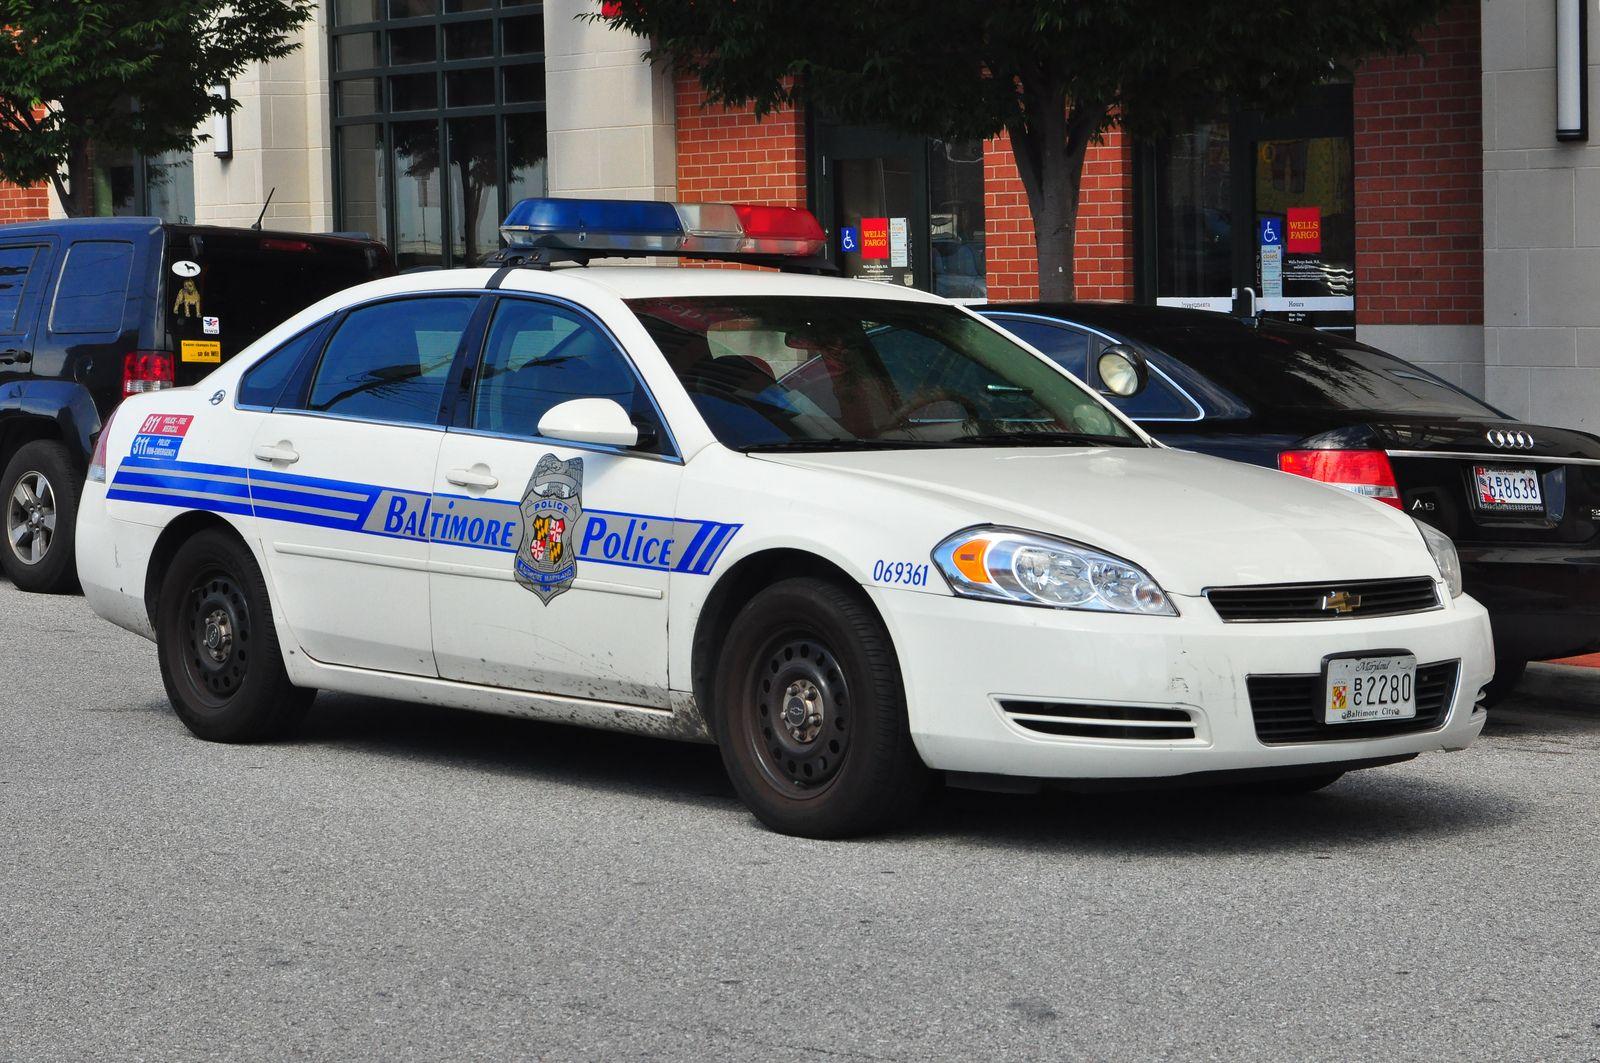 Baltimore Police Chevrolet Impala Rmp Baltimore Police Police Cars Chevrolet Impala